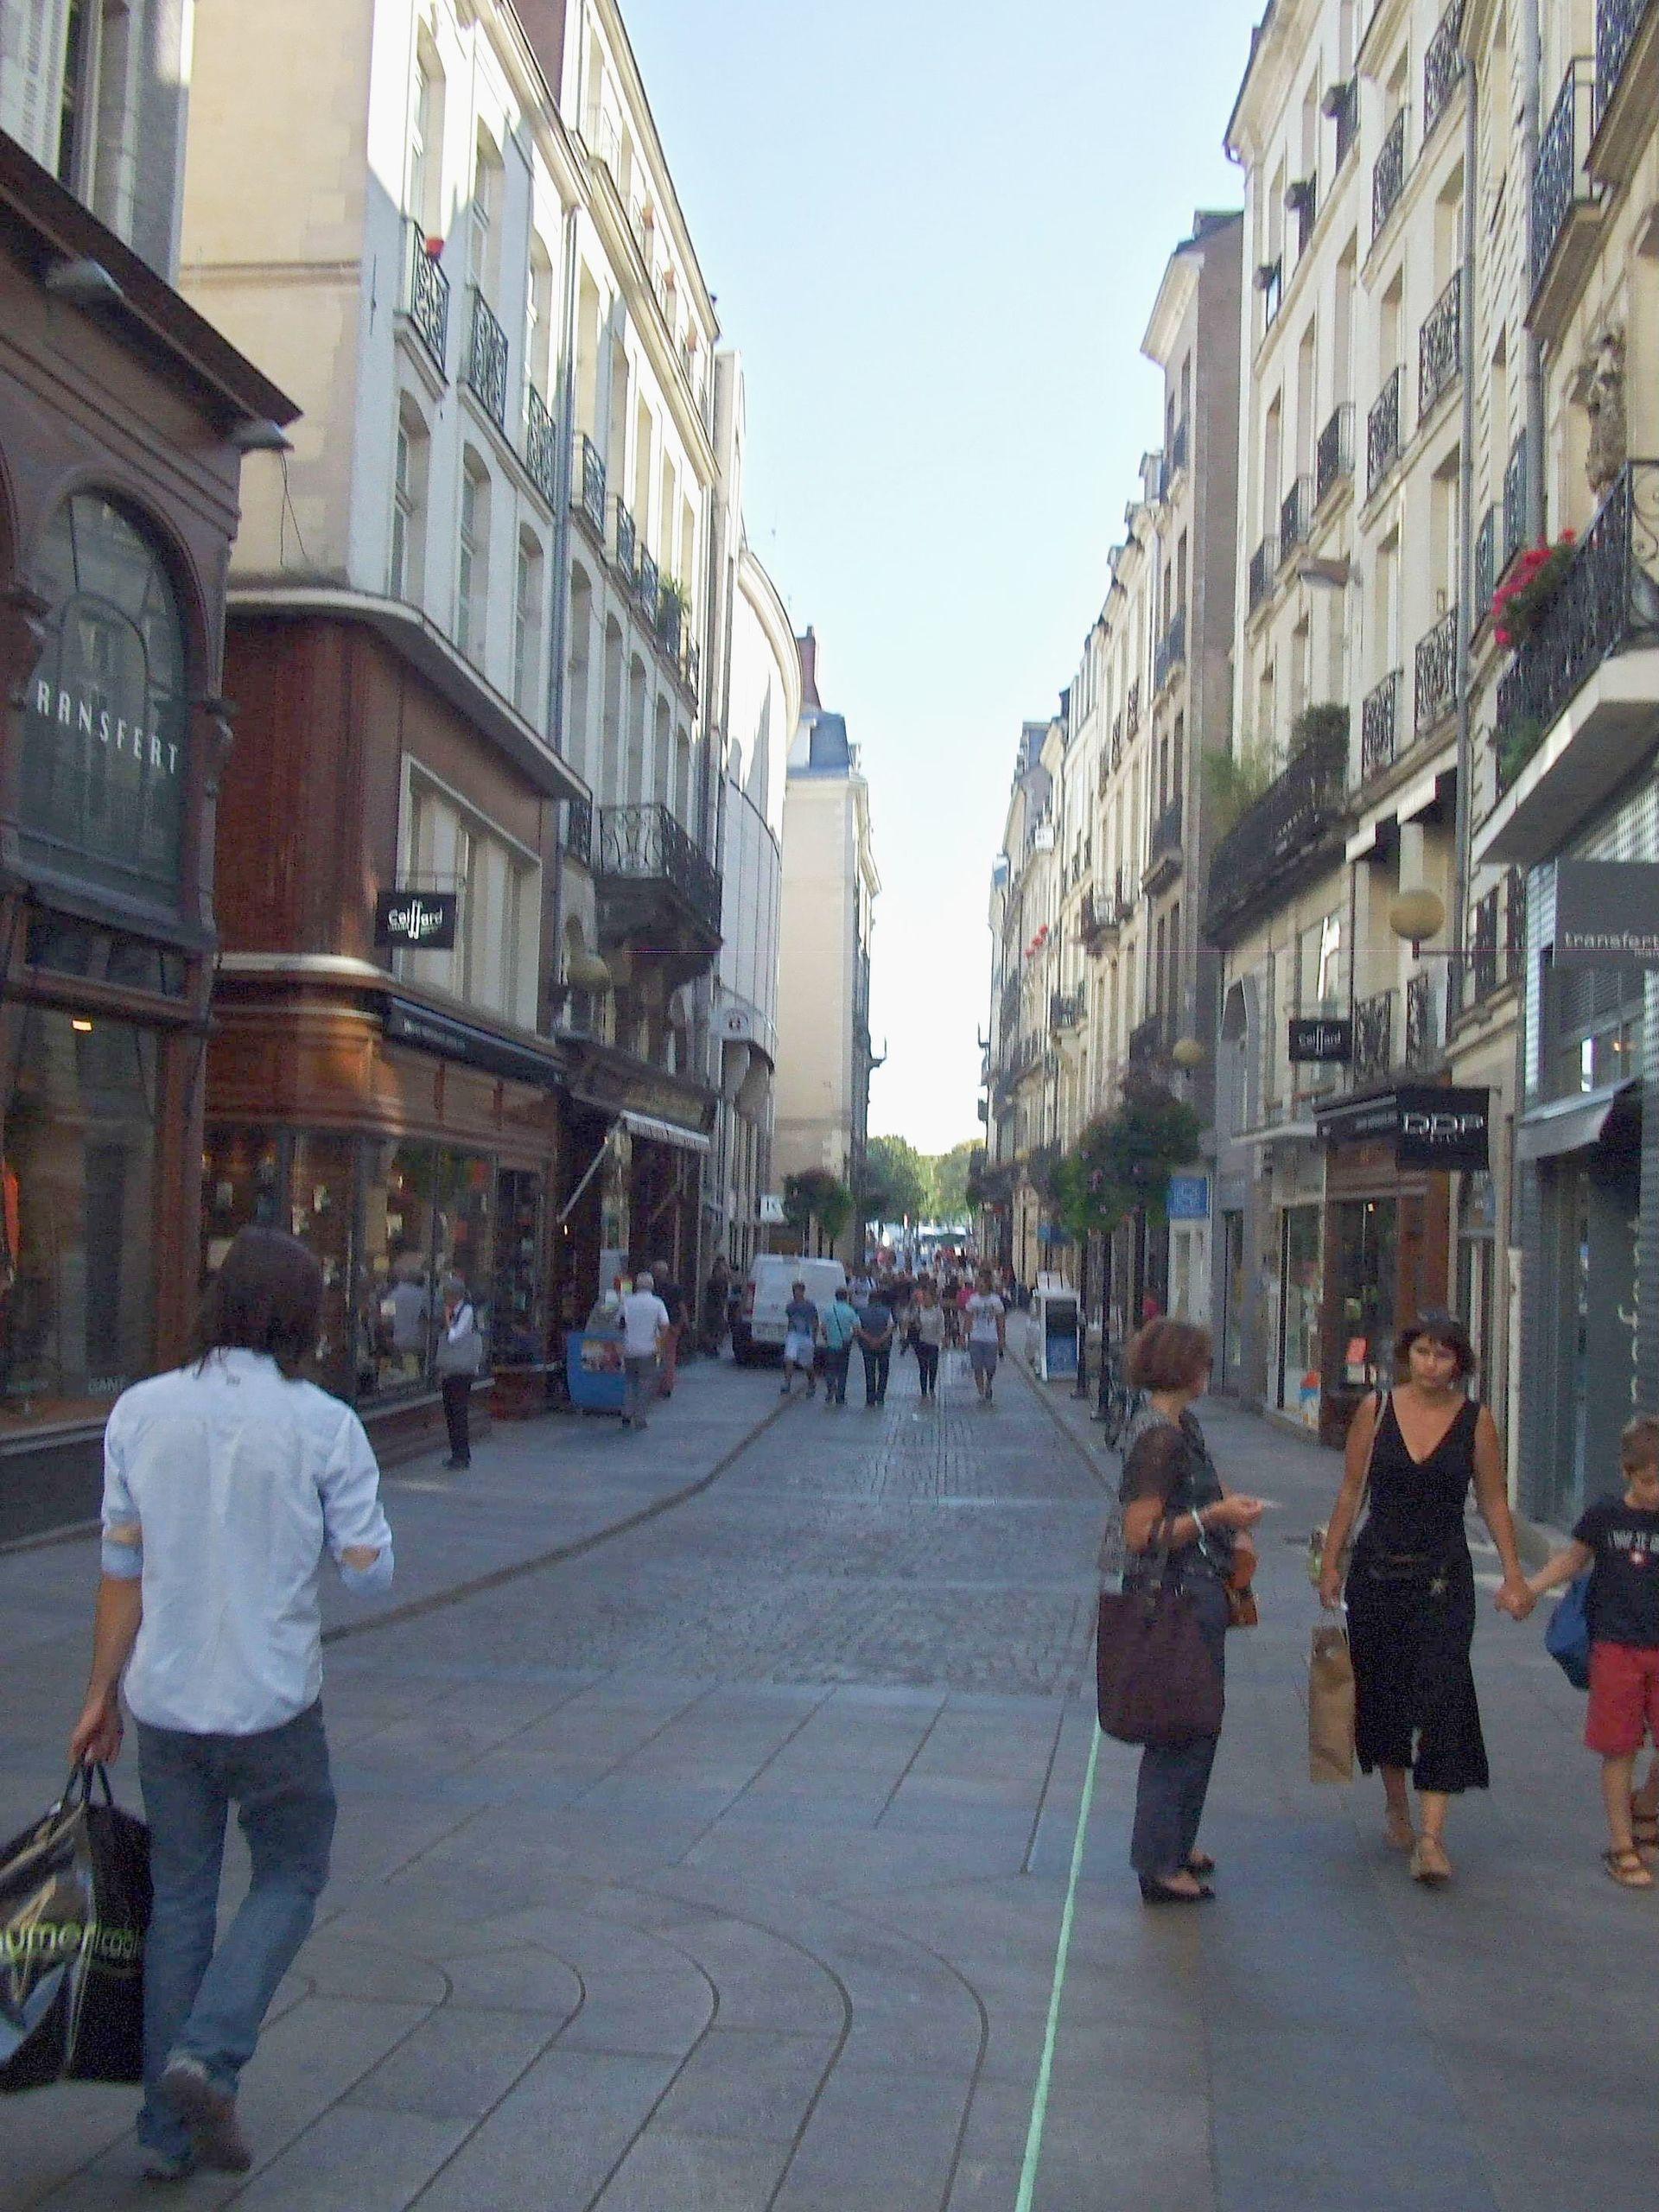 Rue de la fosse wikip dia - Comptoir des lustres nantes ...